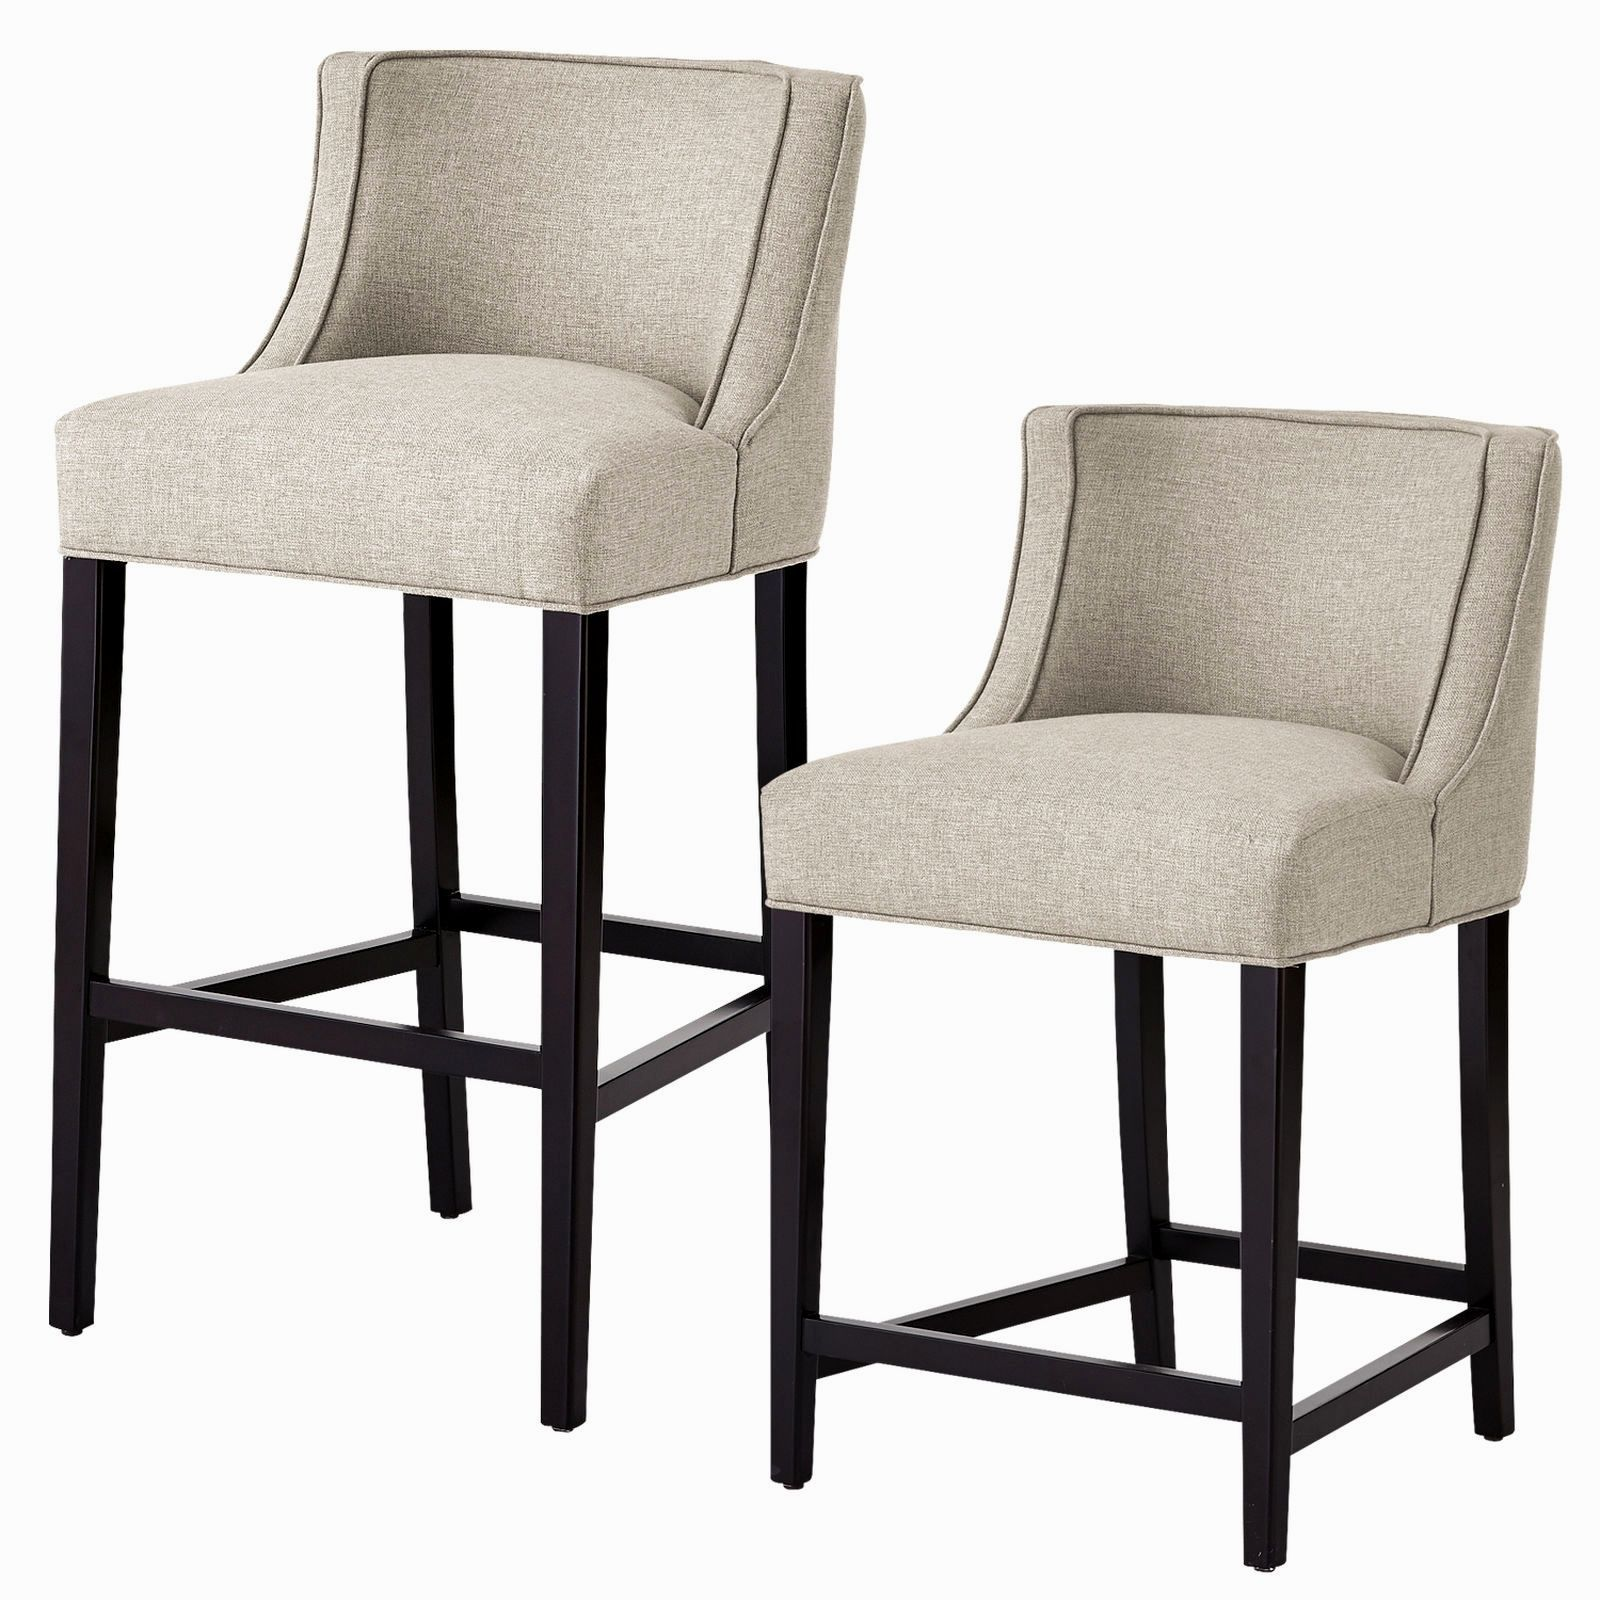 contemporary rustic modern furniture outdoor. Contemporary Rustic Modern Furniture Outdoor. 20+ Average Bar Stool Seat Height - Outdoor U